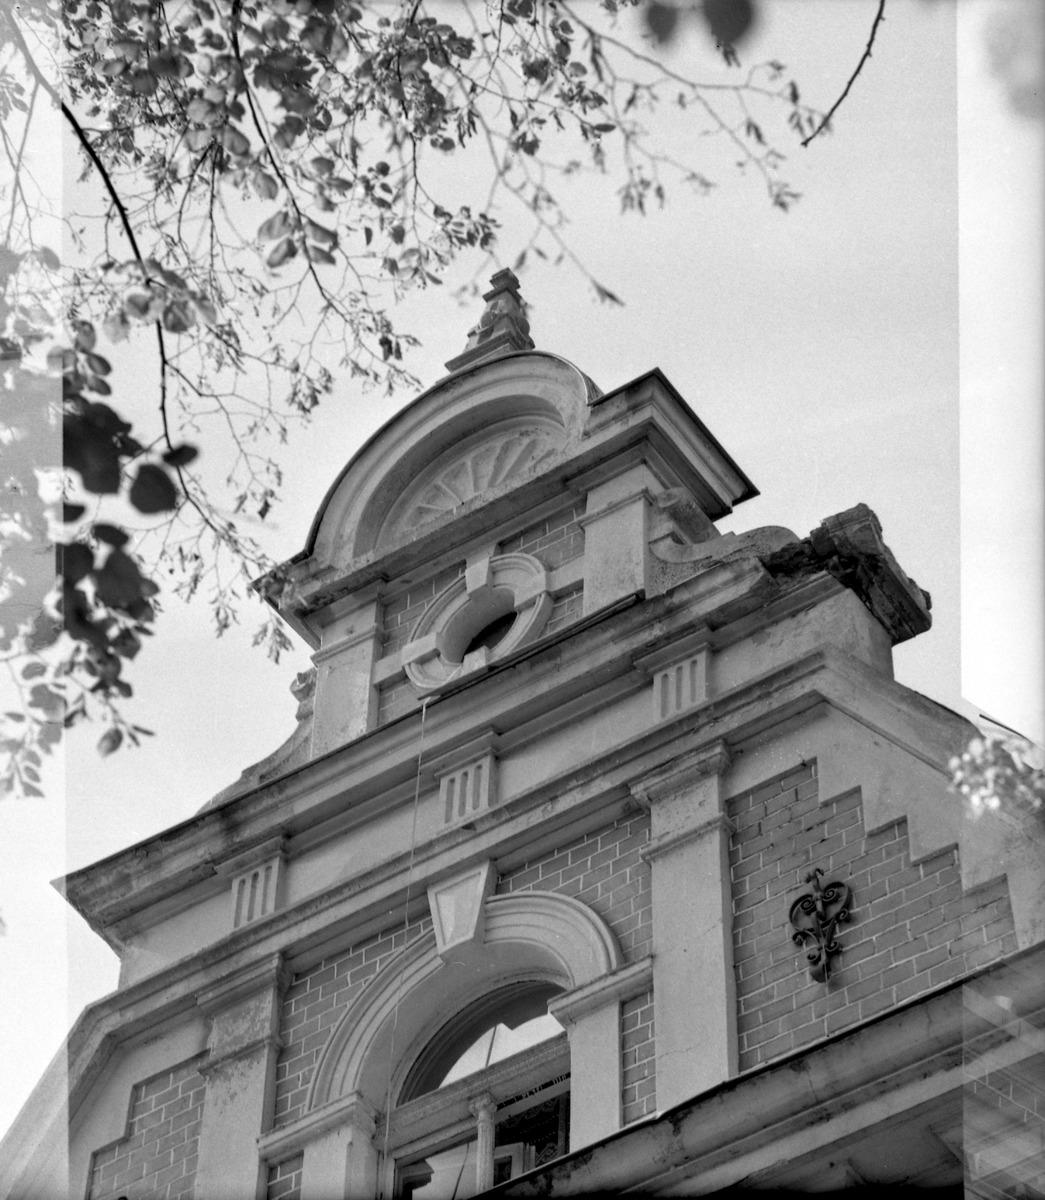 Architektura dawnego Giżycka, 1986 r.